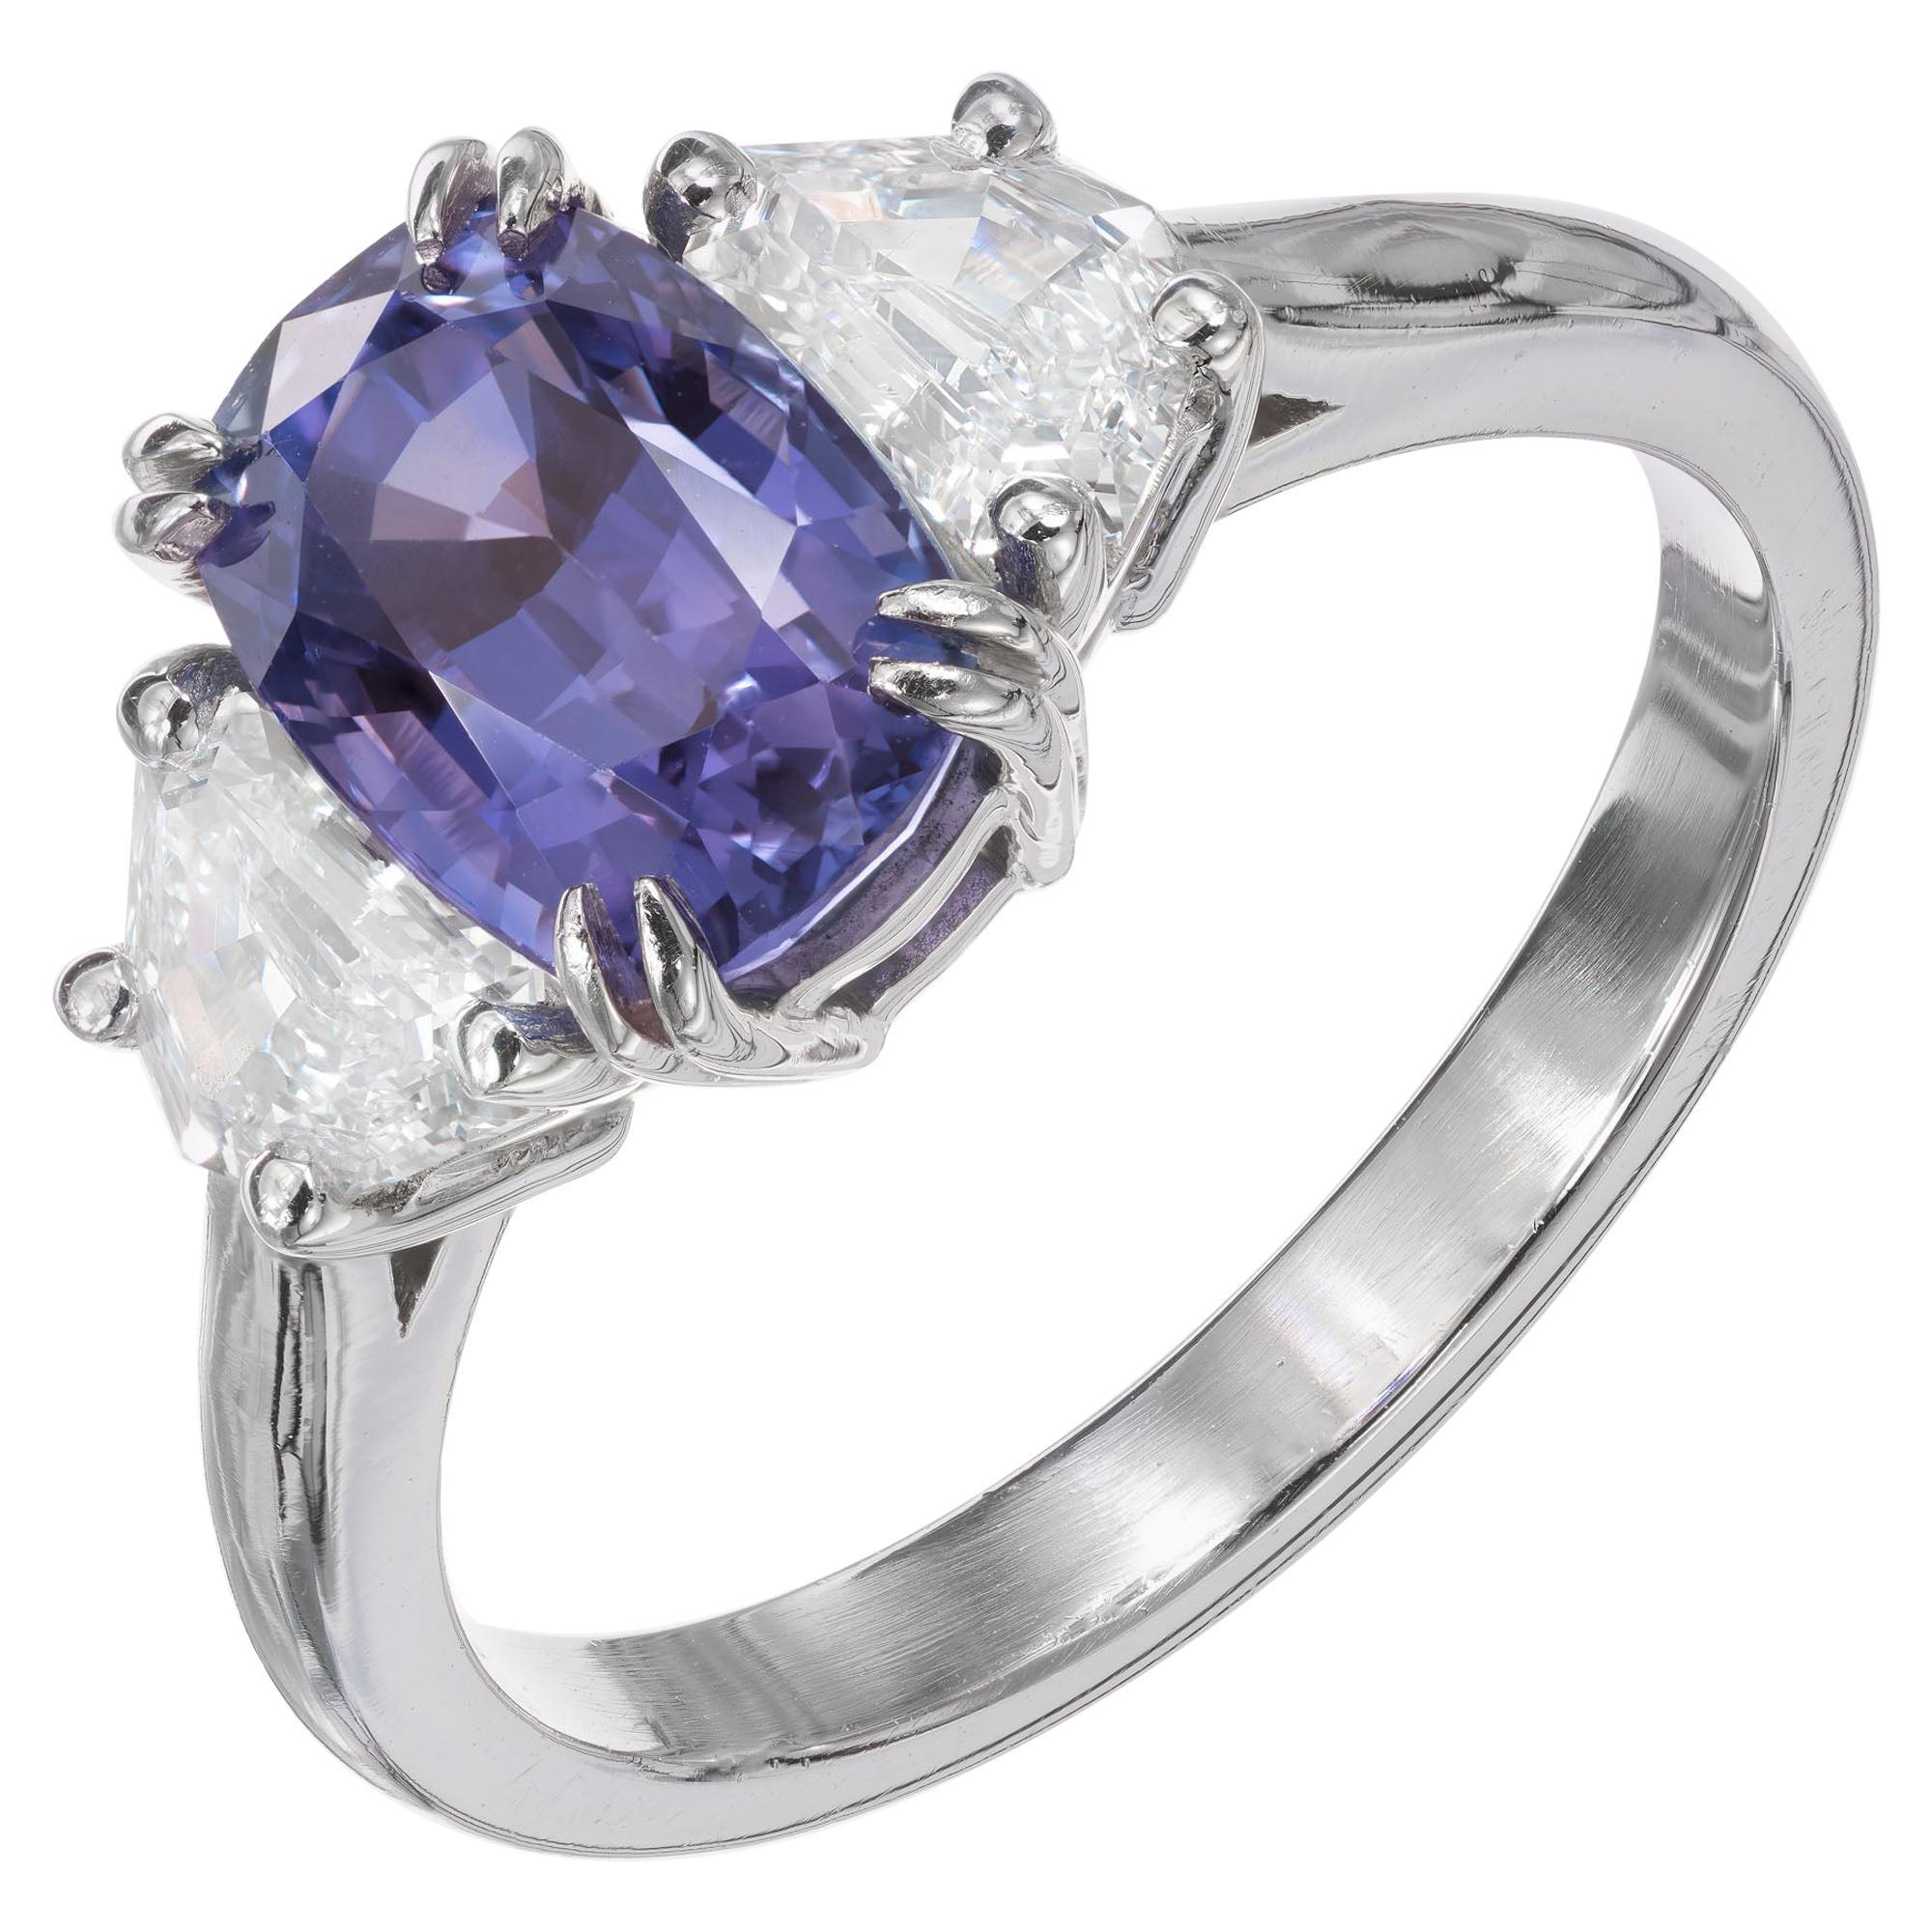 Peter Suchy GIA 3.07 Carat Sapphire Diamond Platinum Three-Stone Engagement Ring